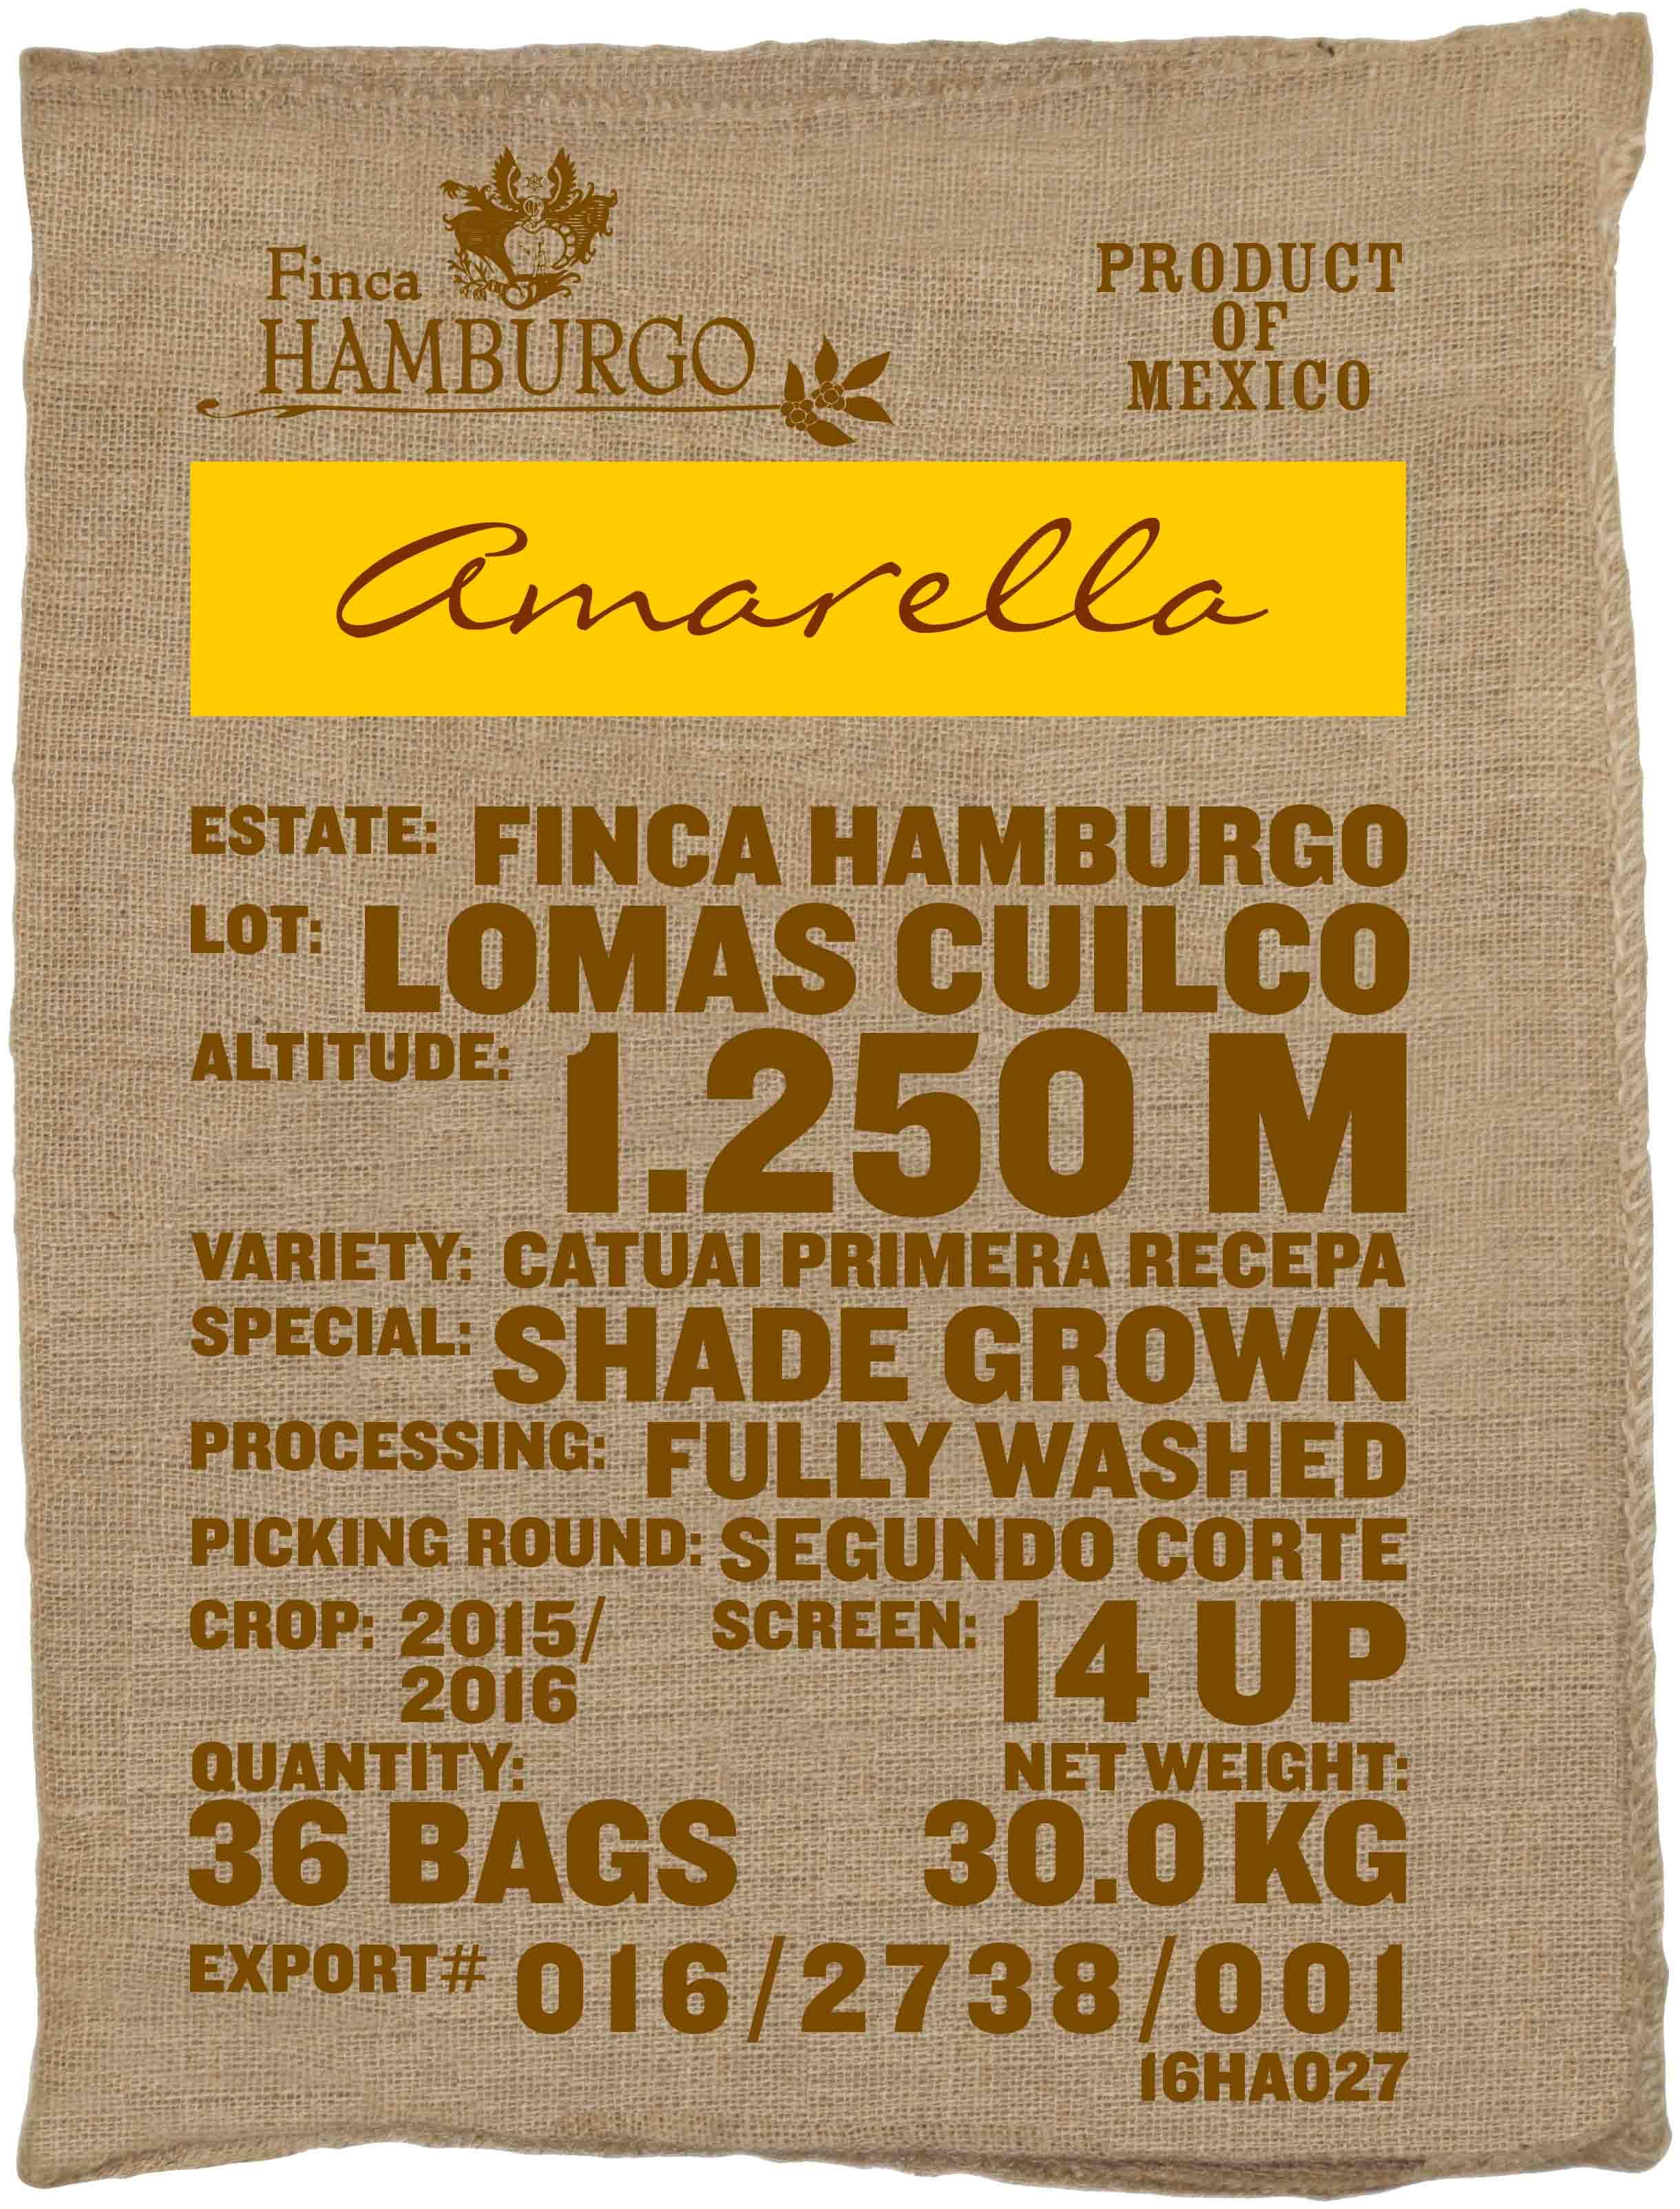 Ein Rohkaffeesack amarella Parzellenkaffee Varietät Catuai Primera Recepa. Finca Hamburgo Lot Lomas Cuilco.